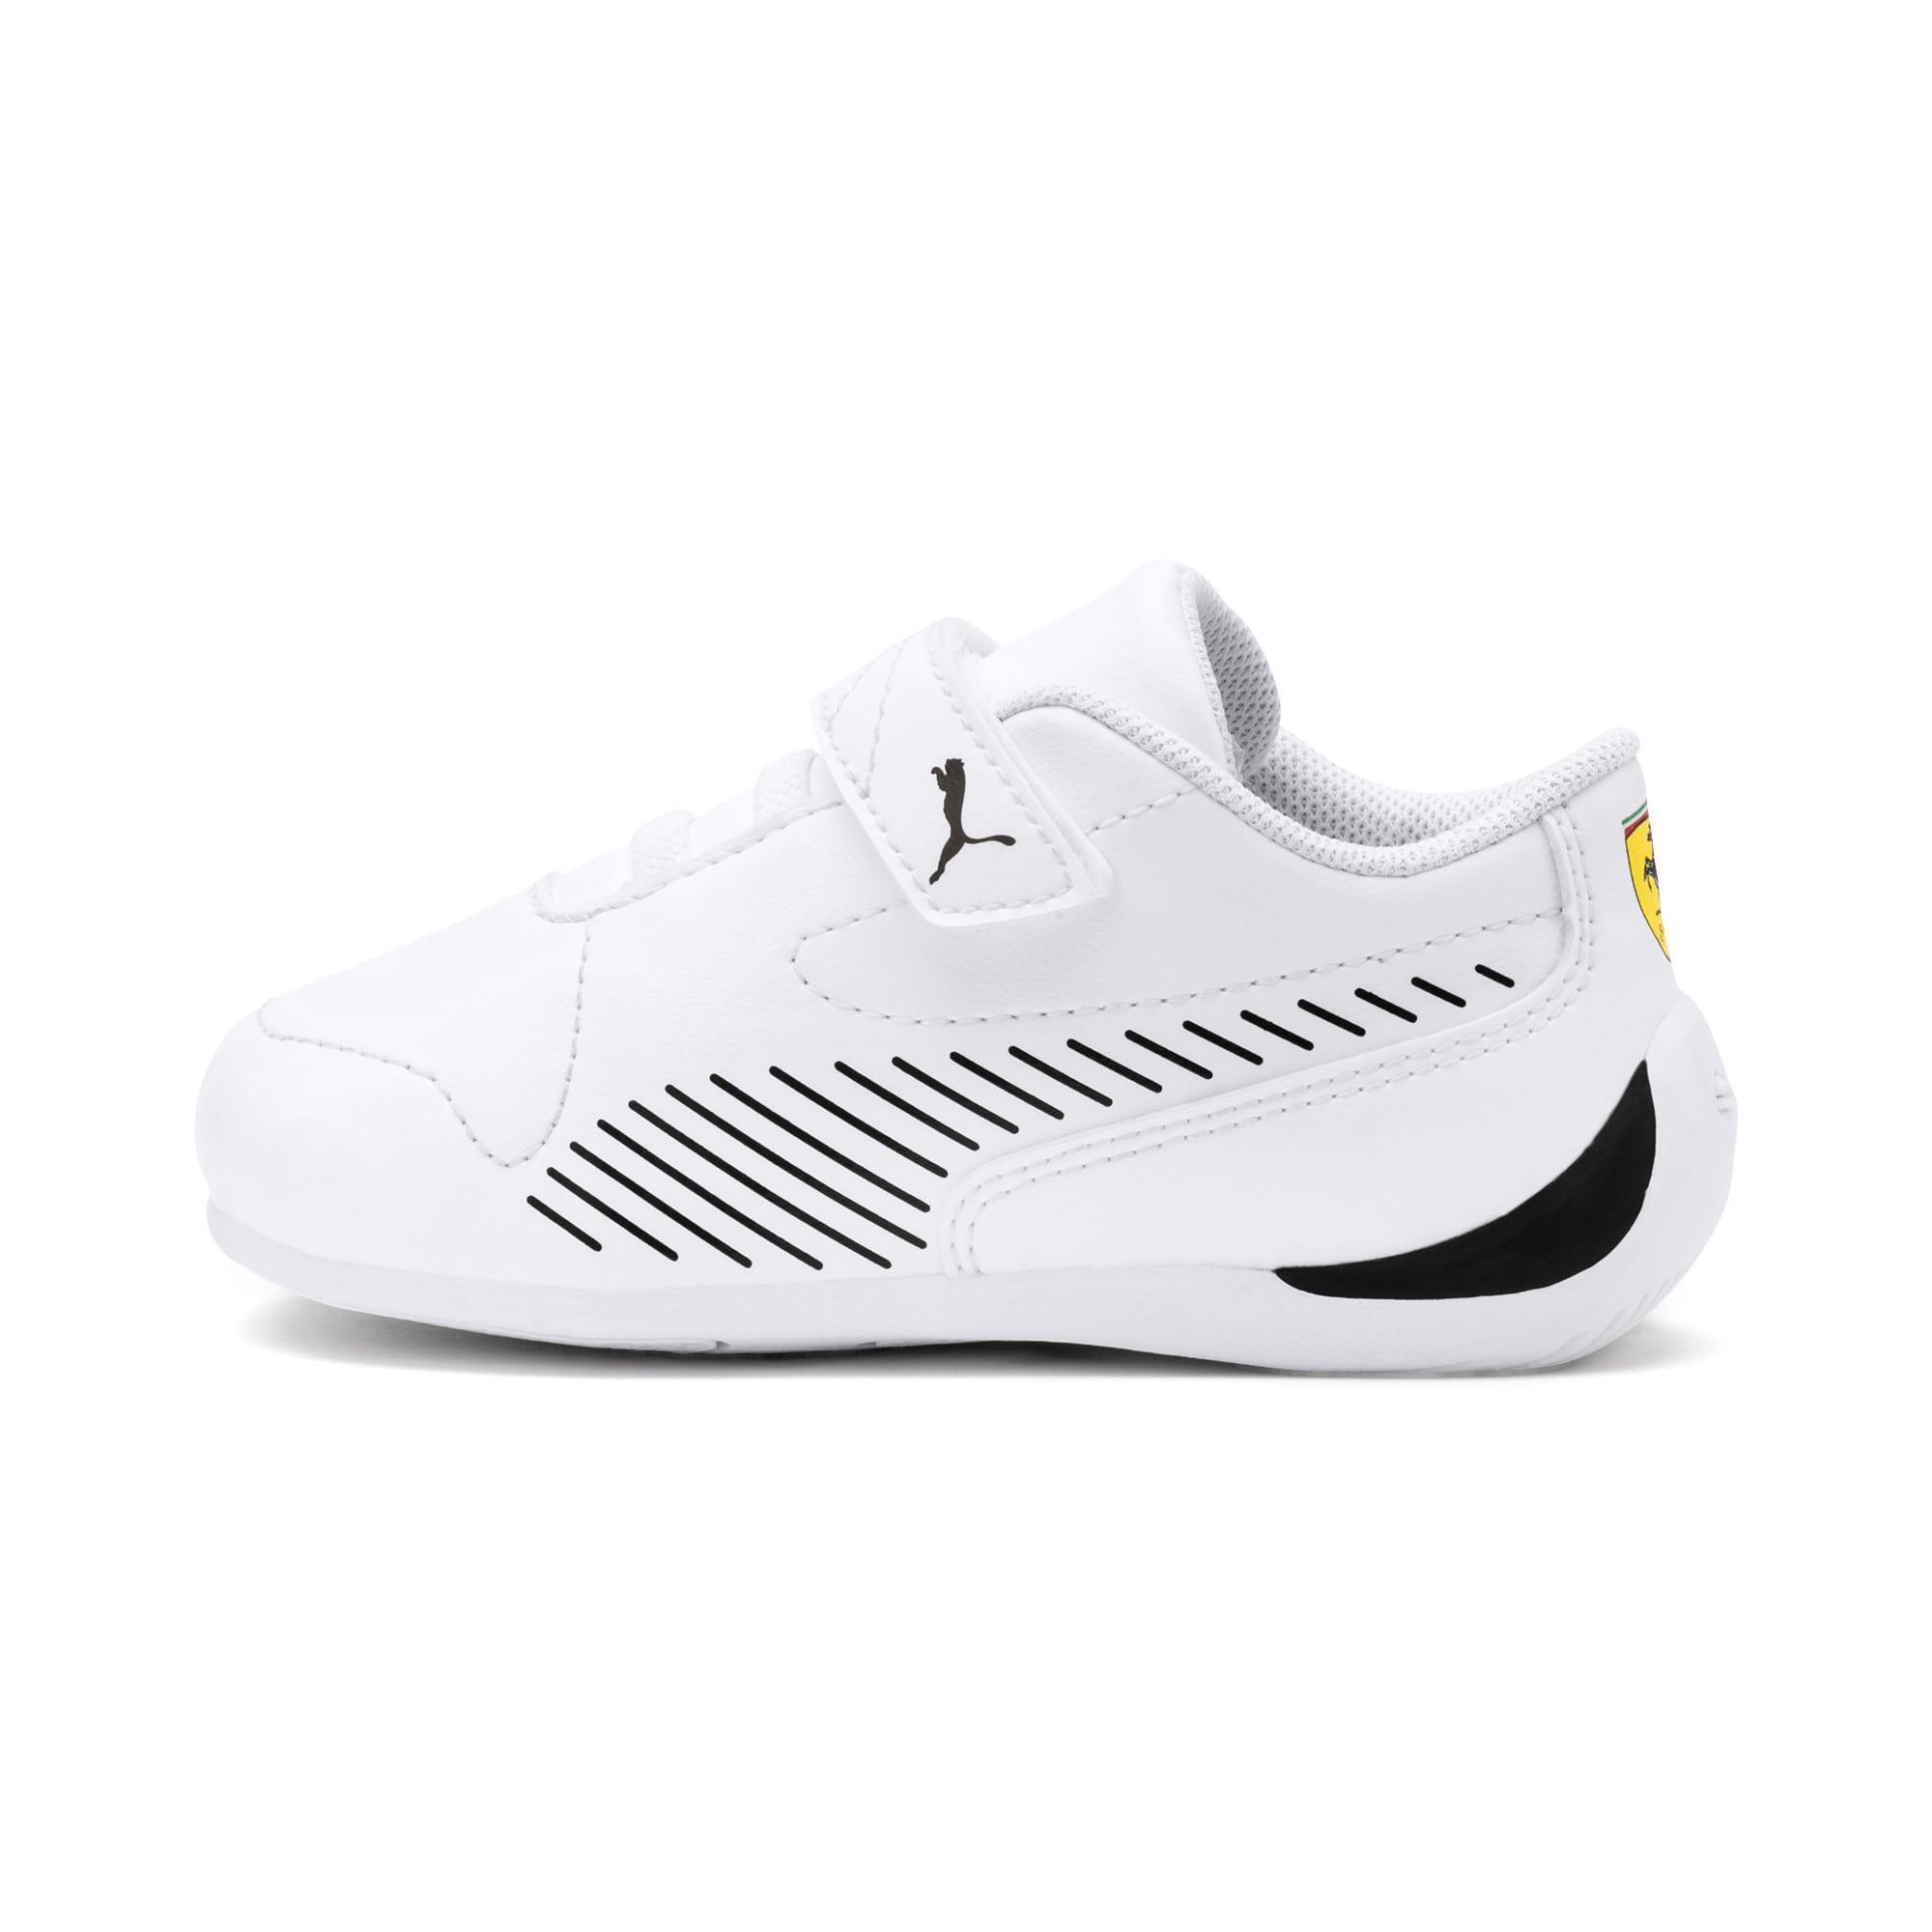 Thumbnail 1 of Ferrari Drift Cat 7S Ultra Kids Sneaker, Puma White-Puma Black, medium